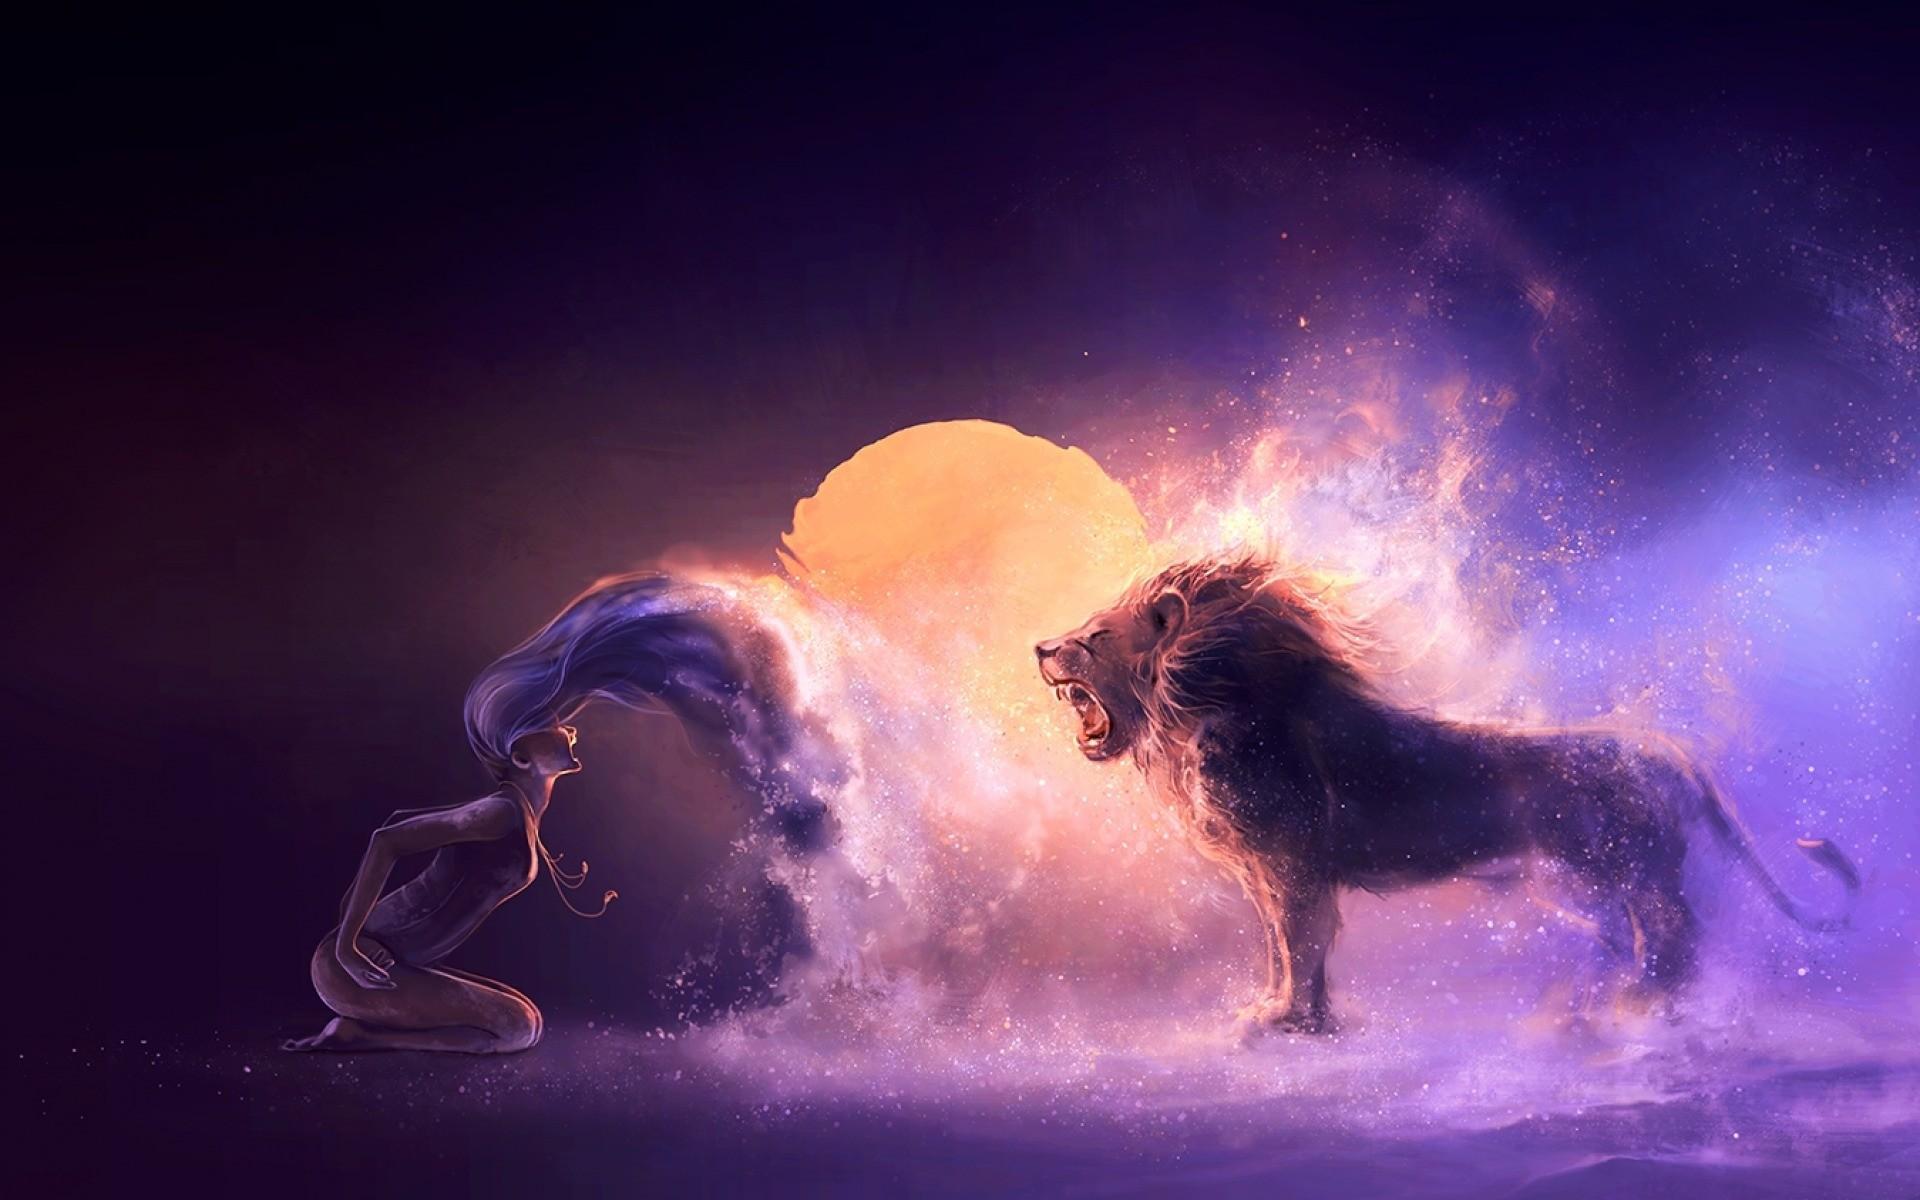 Download Leo Zodiac Wallpaper Hd Backgrounds Download Itl Cat